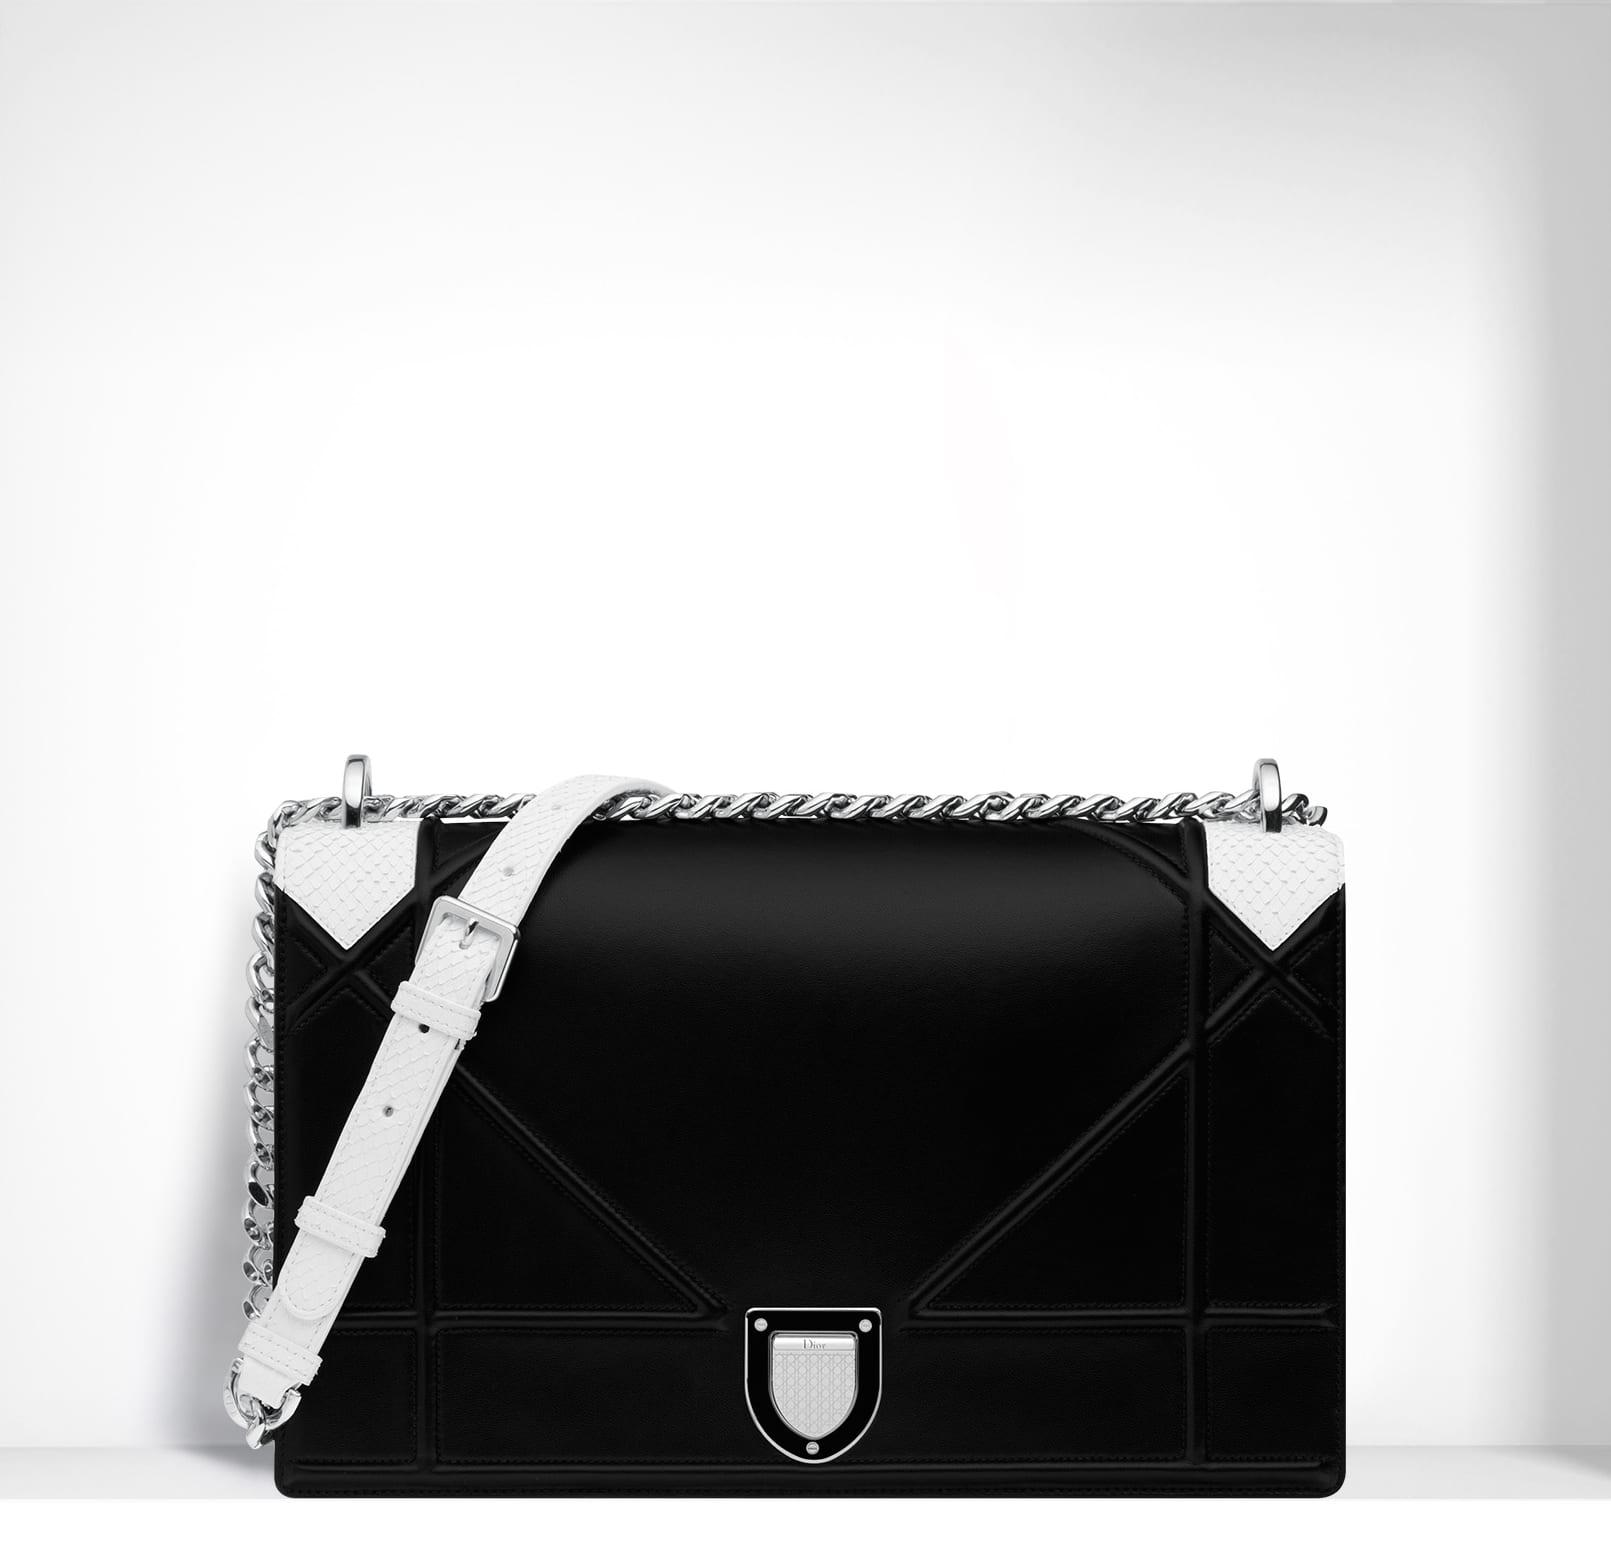 b5d7d4309f45 Dior Black White Python Lambskin Diorama Large Flap Bag